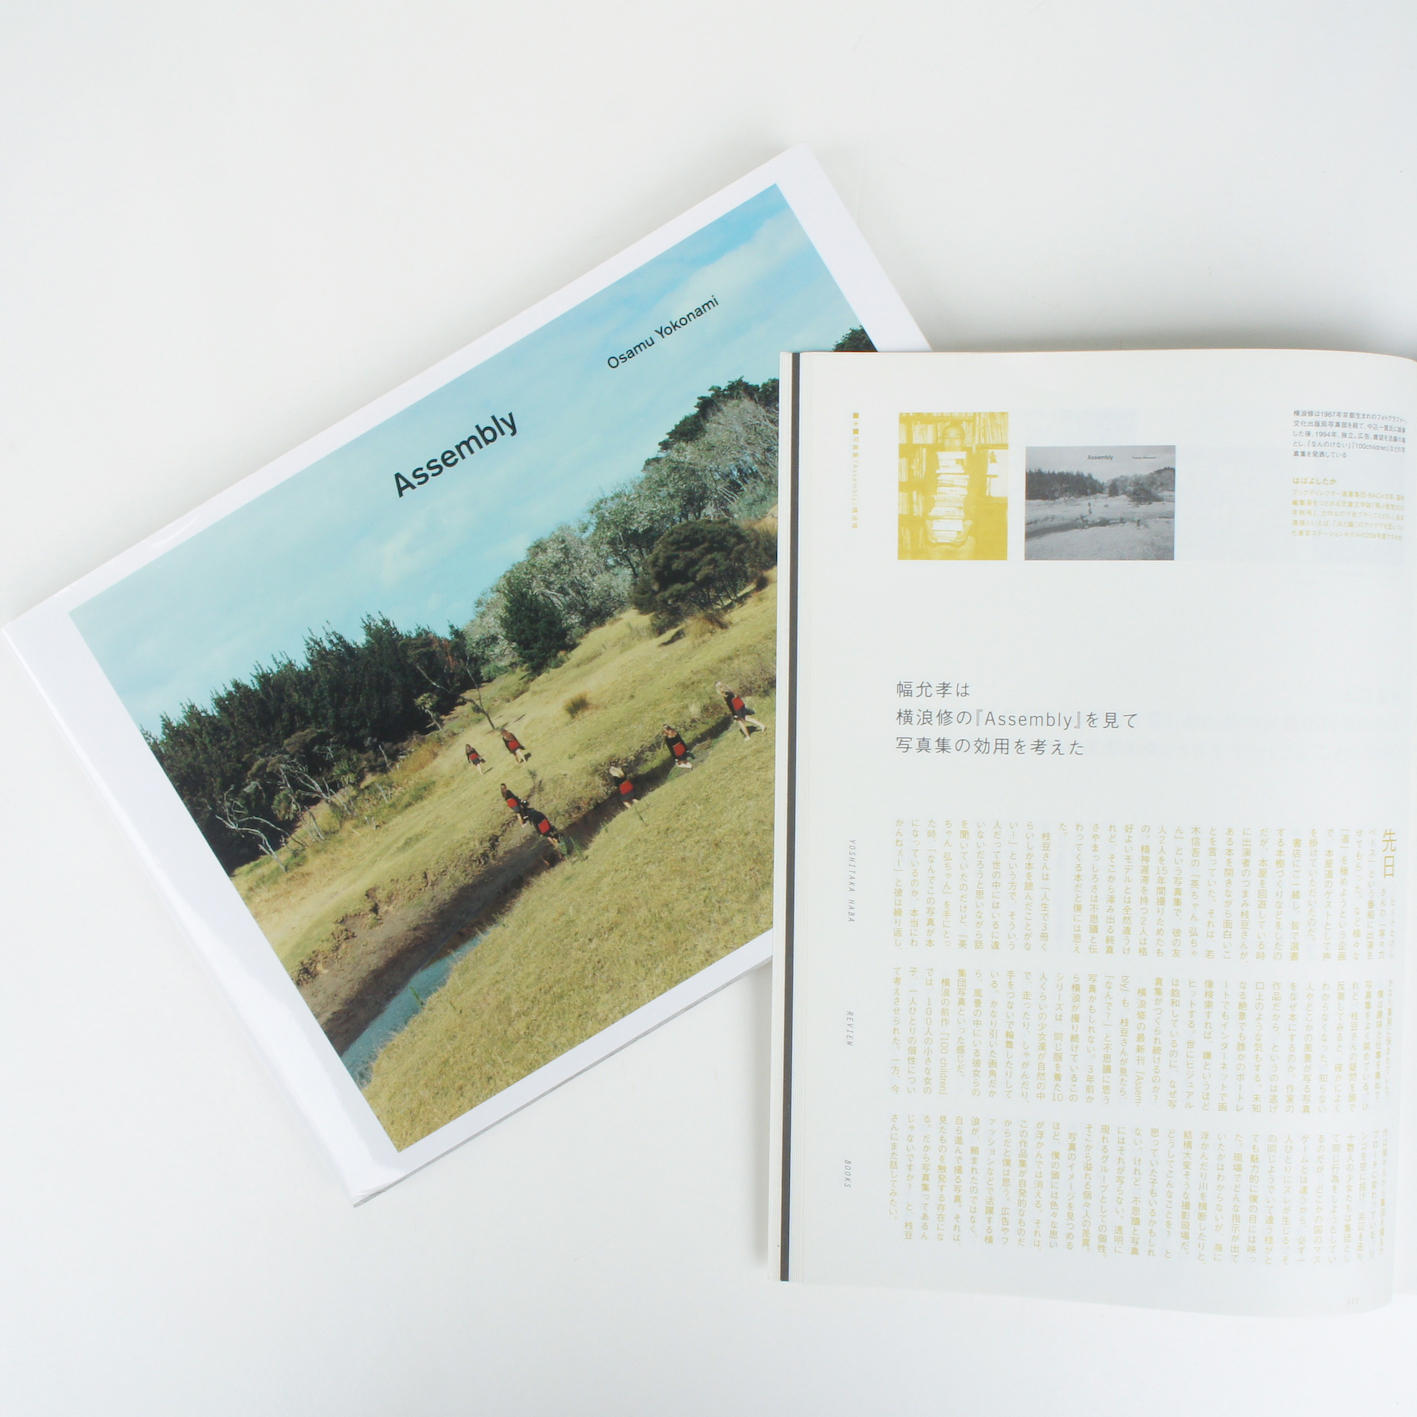 DSC09382のコピー.jpg